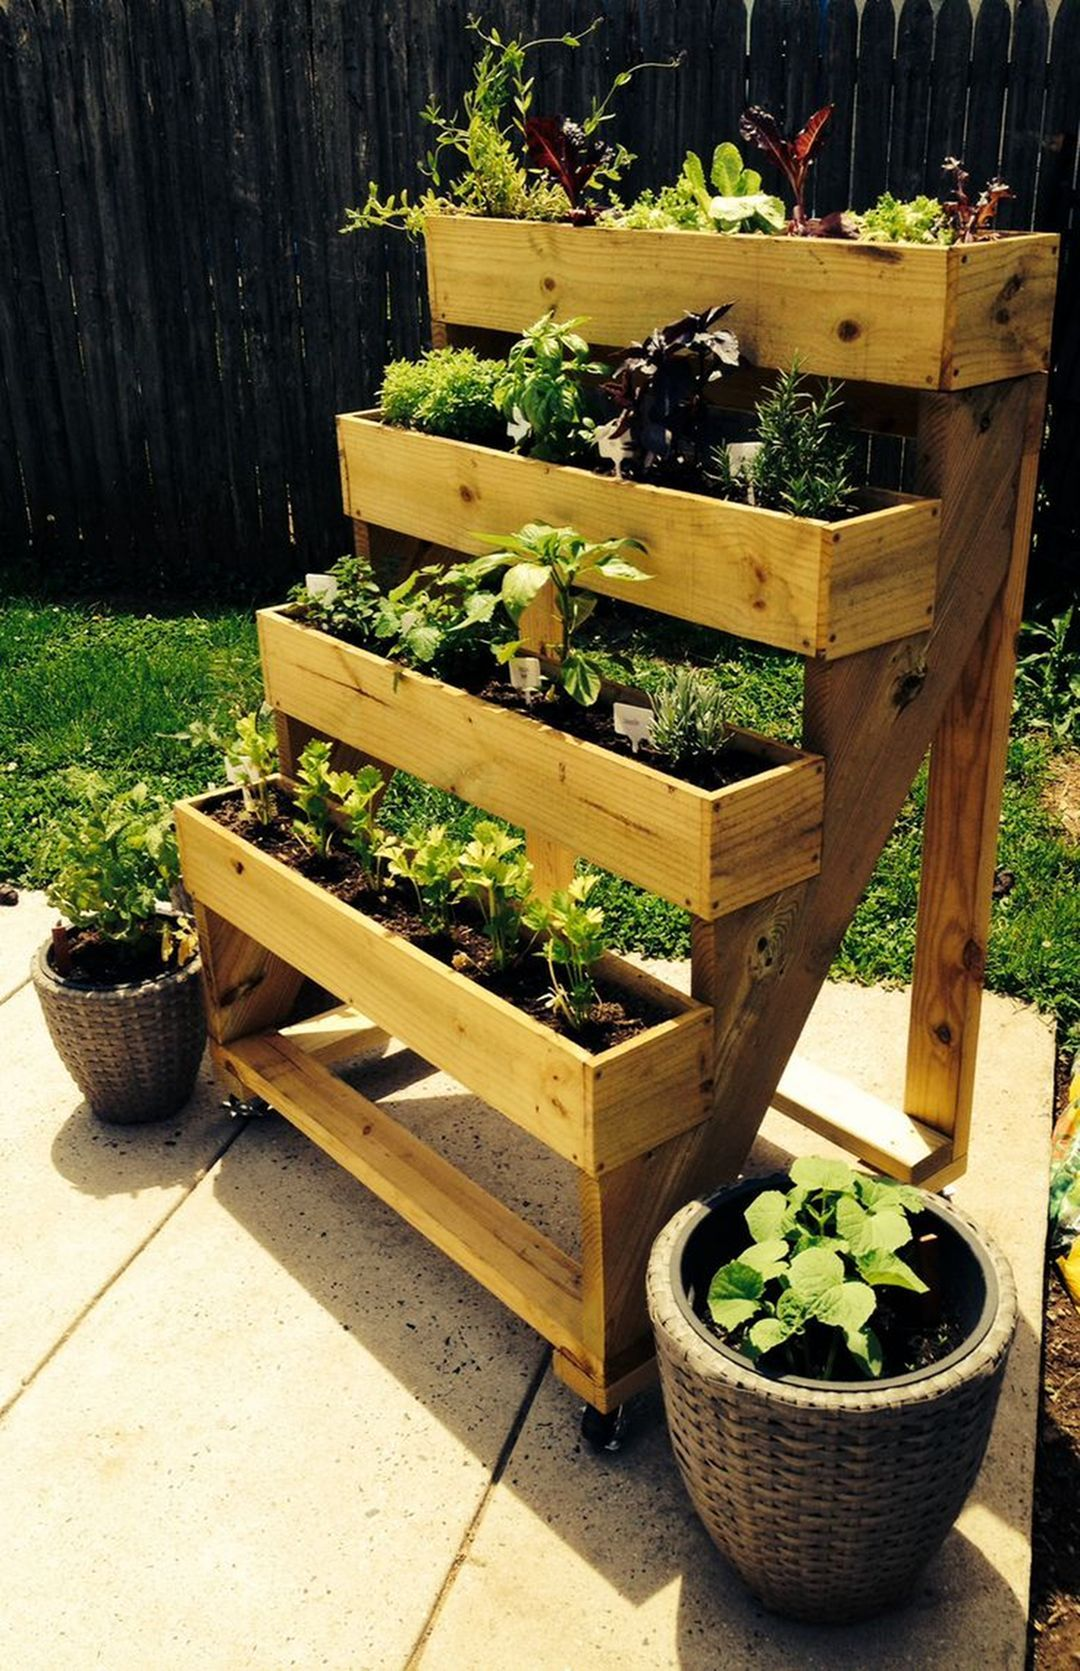 30+ Wonderful DIY Garden Planter Ideas To Enhance Your